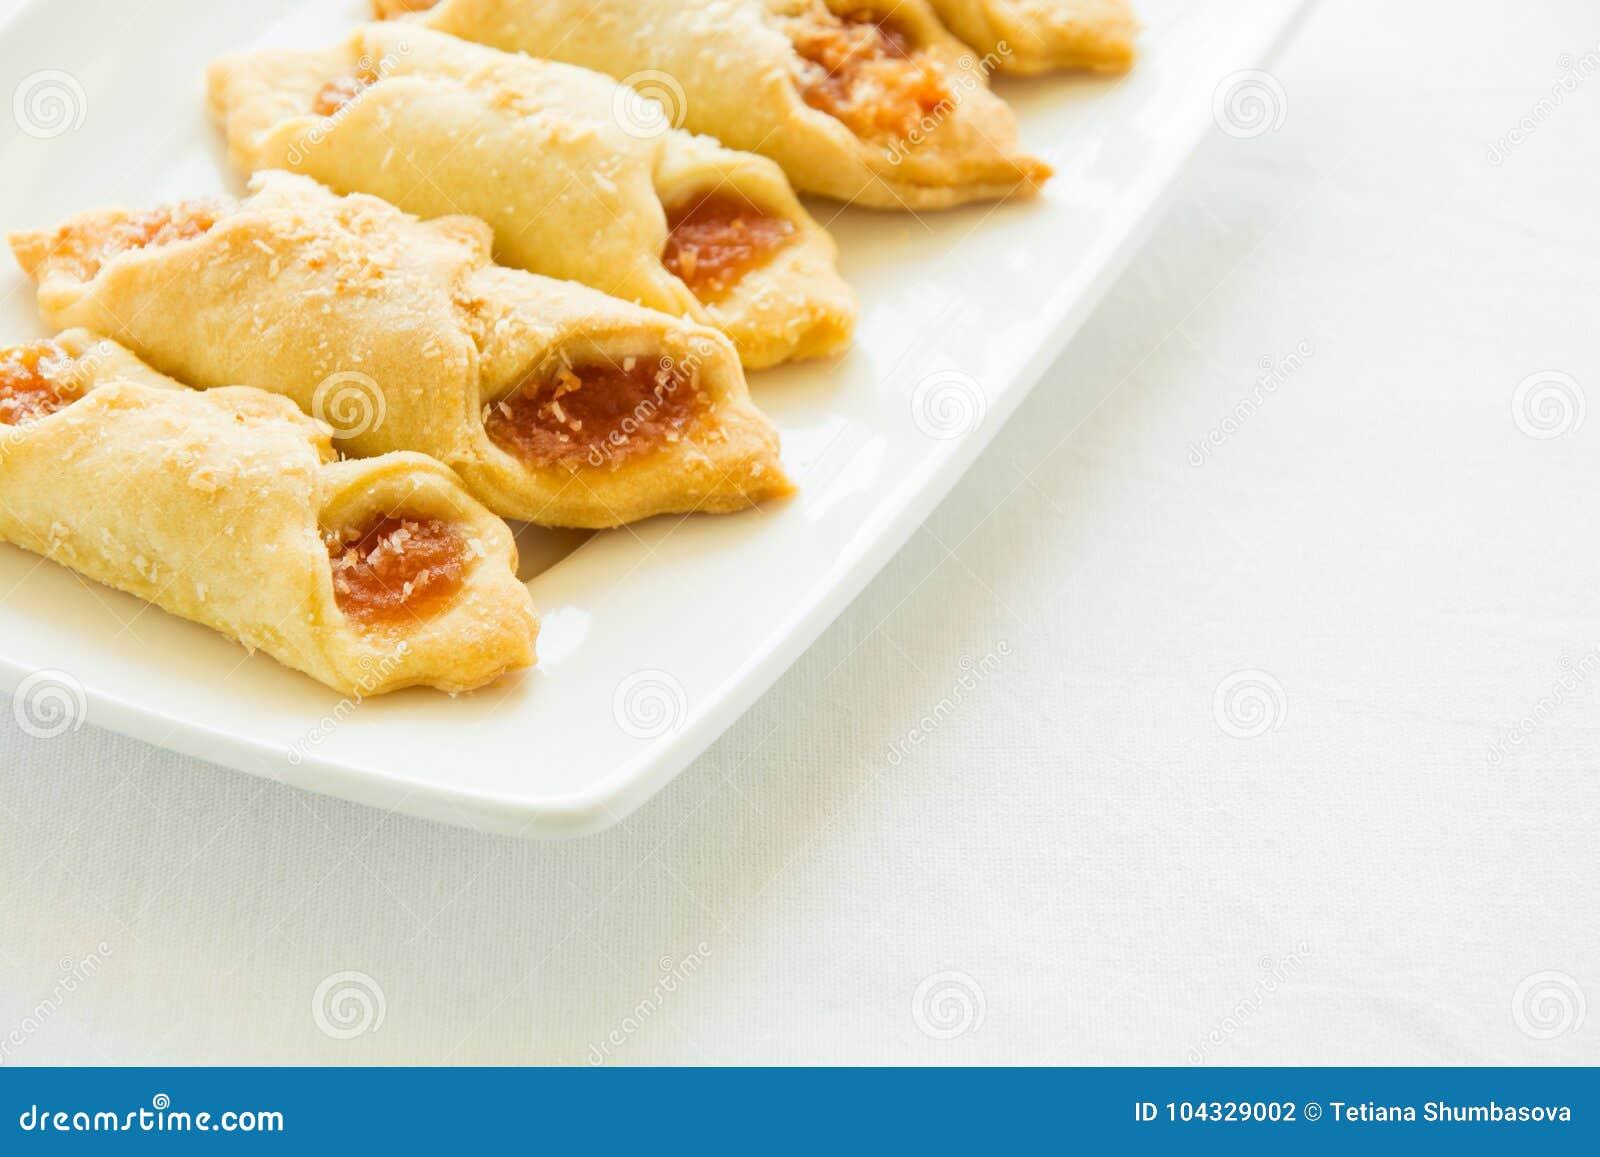 download tea time with polish cream cheese cookies kolacky with apple jam stock photo image - Kolacky Polish Christmas Cookies